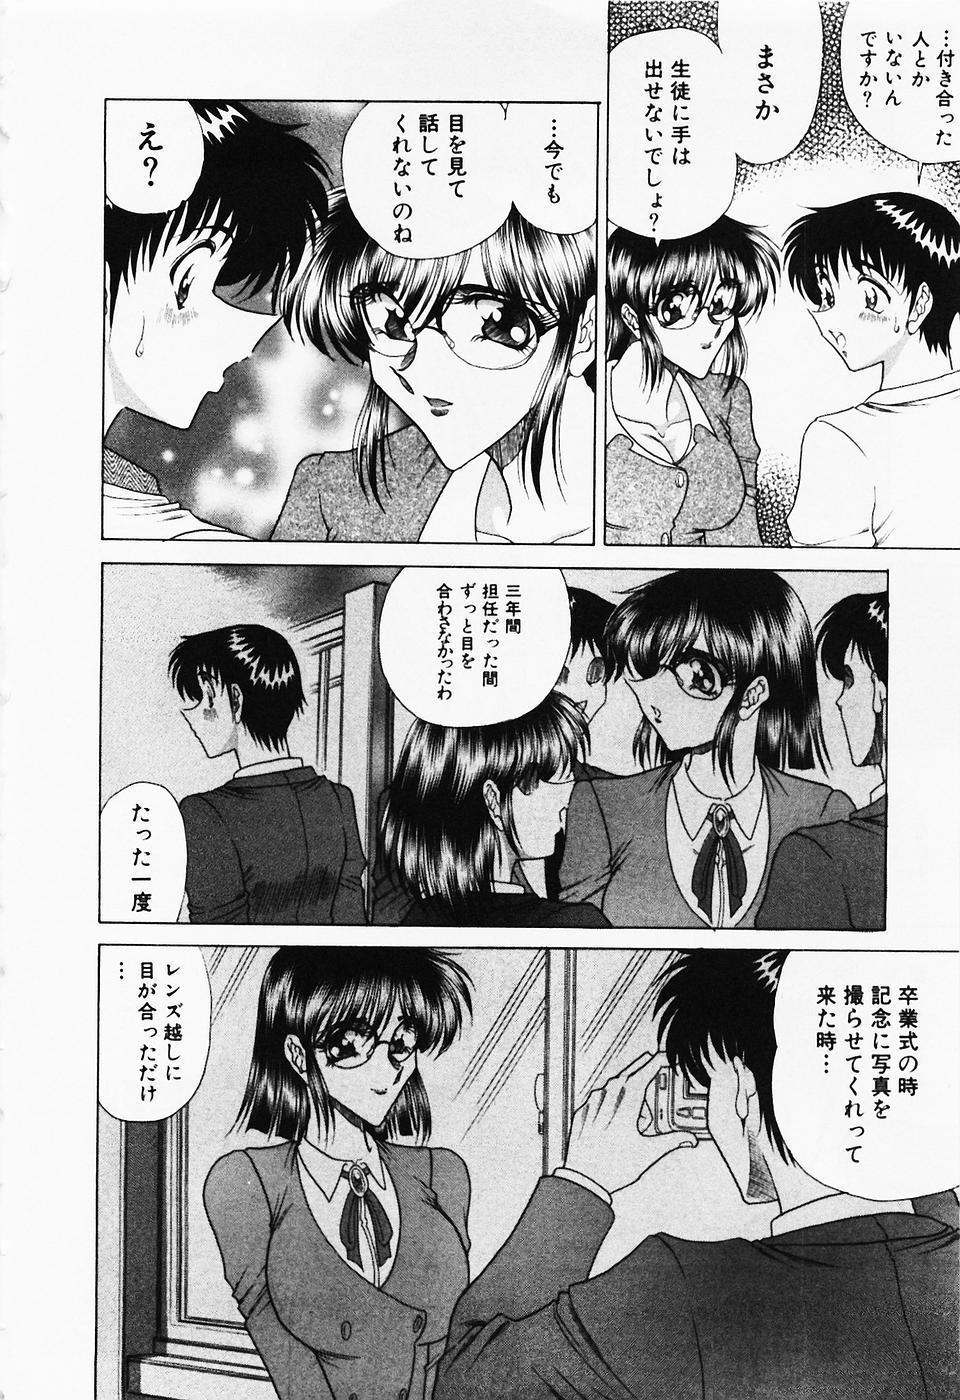 Seifuku Zanmai 108